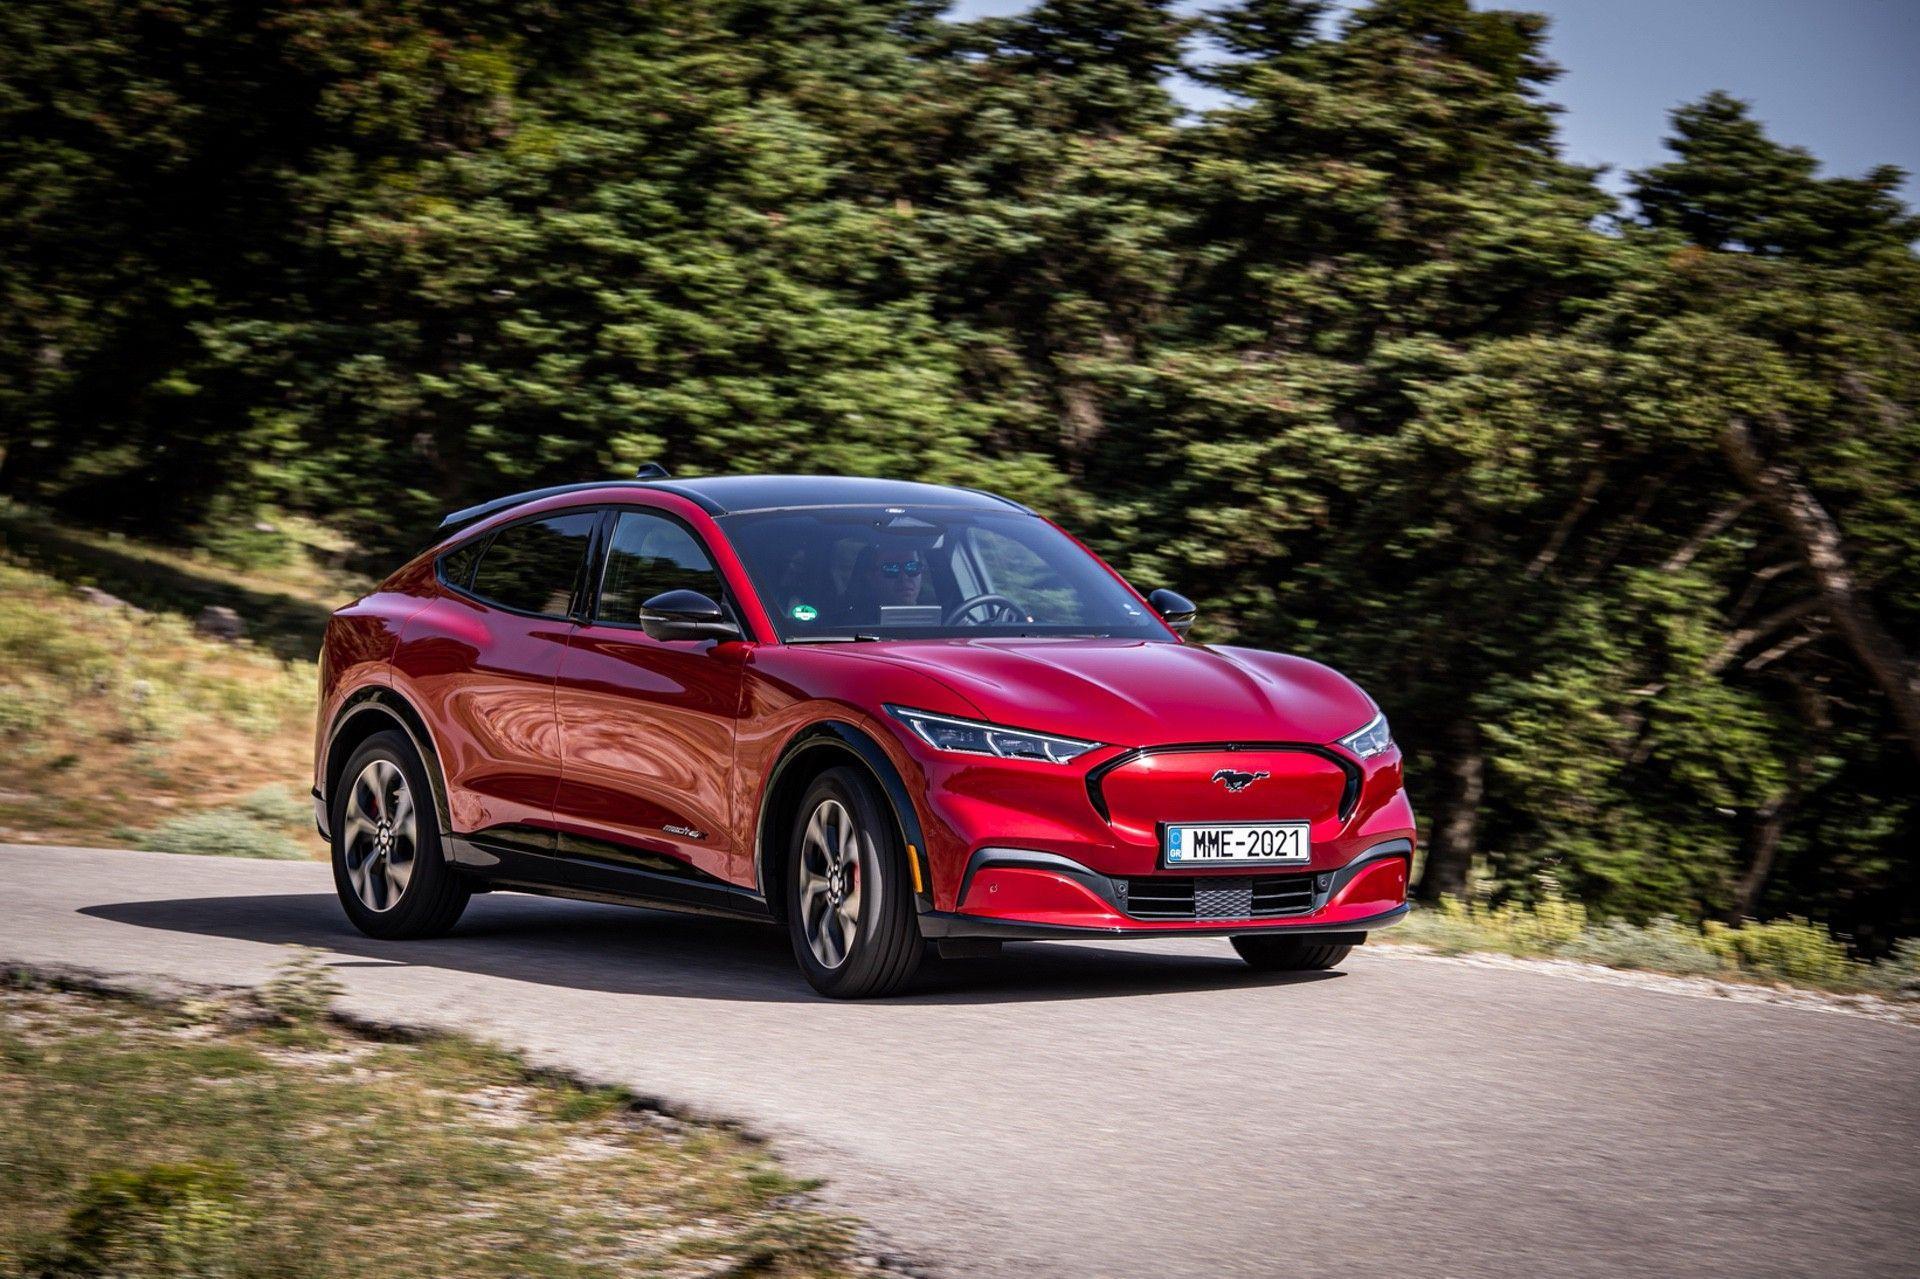 Ford_Mustang_Mach-E_greek_presskit-0127